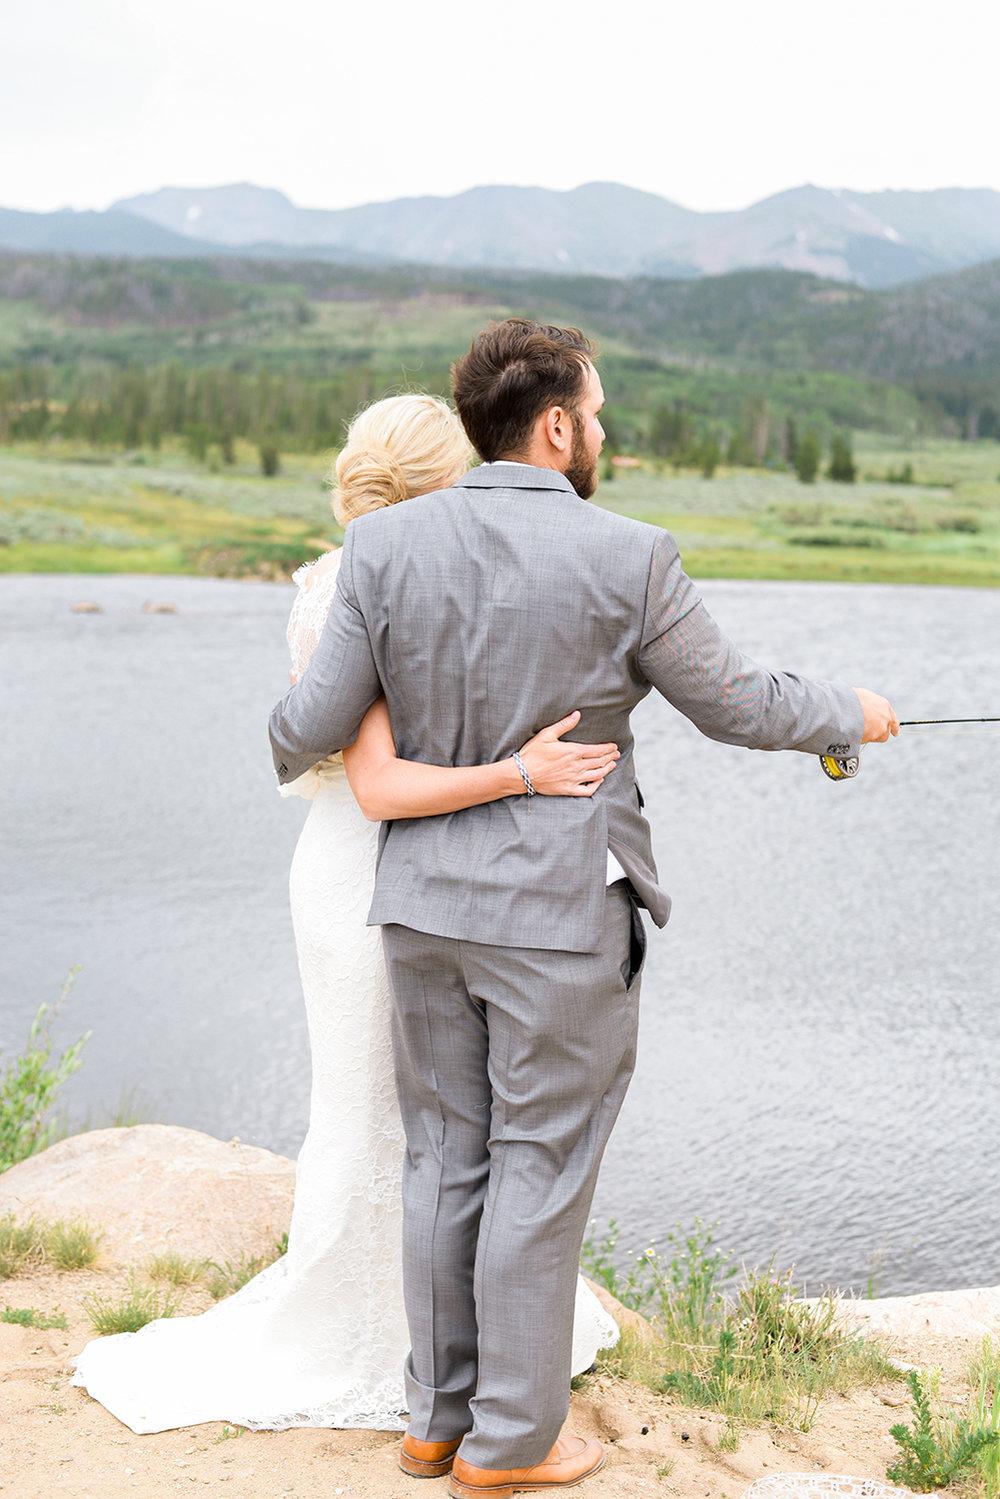 colorado-mountain-wedding-photographer-devils-thumb-ranch-wedding-n-k-8.jpg